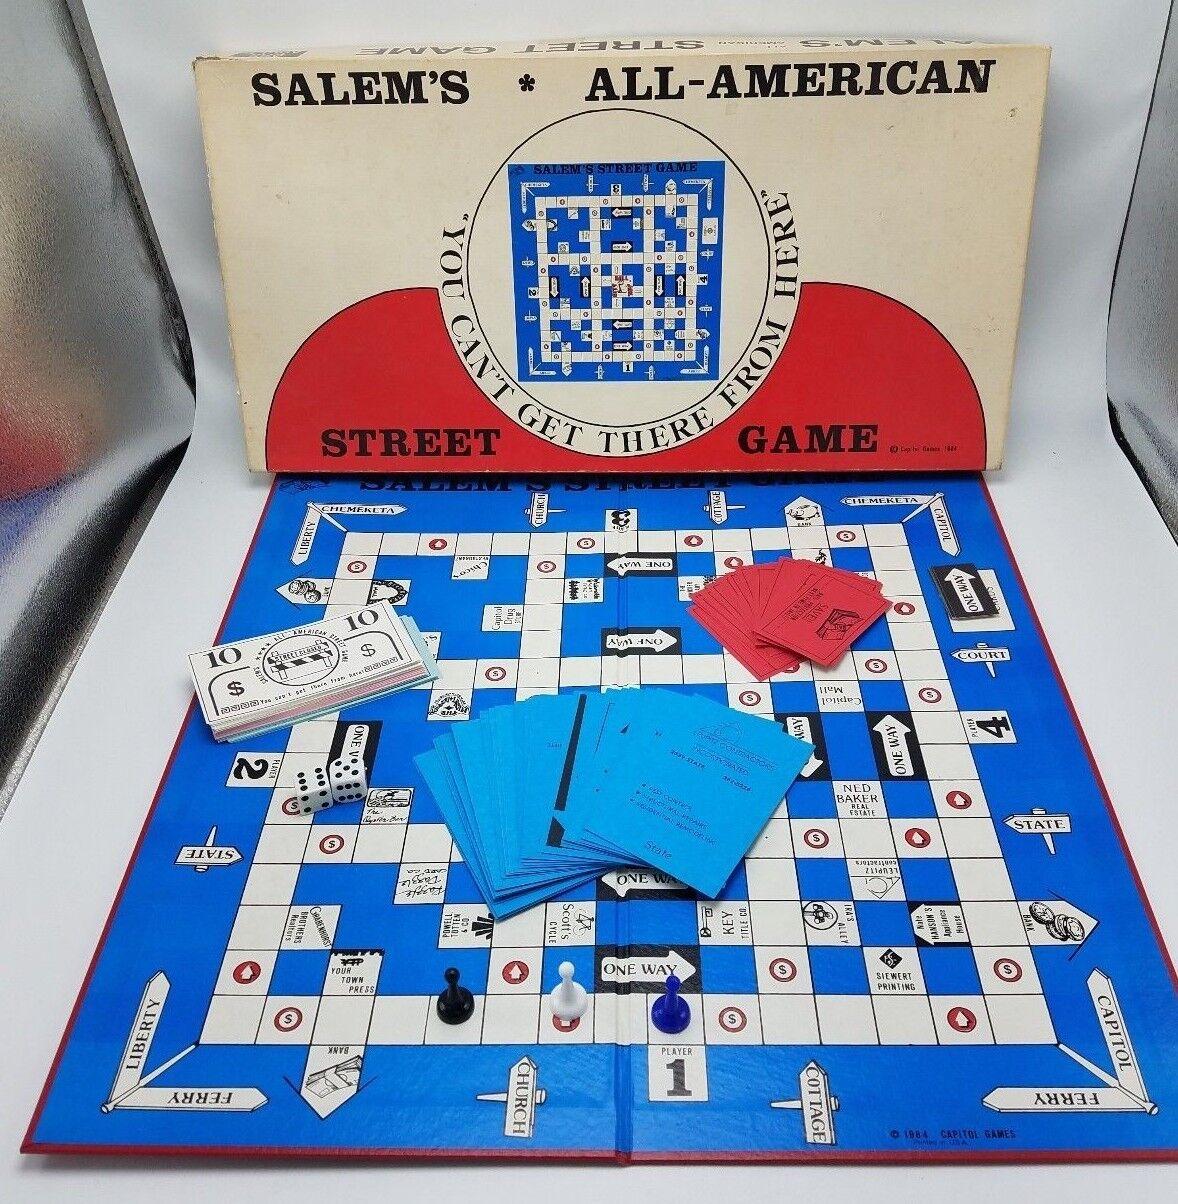 RARE Ephemera Bonus w Game Street All-American Salem'S 1984